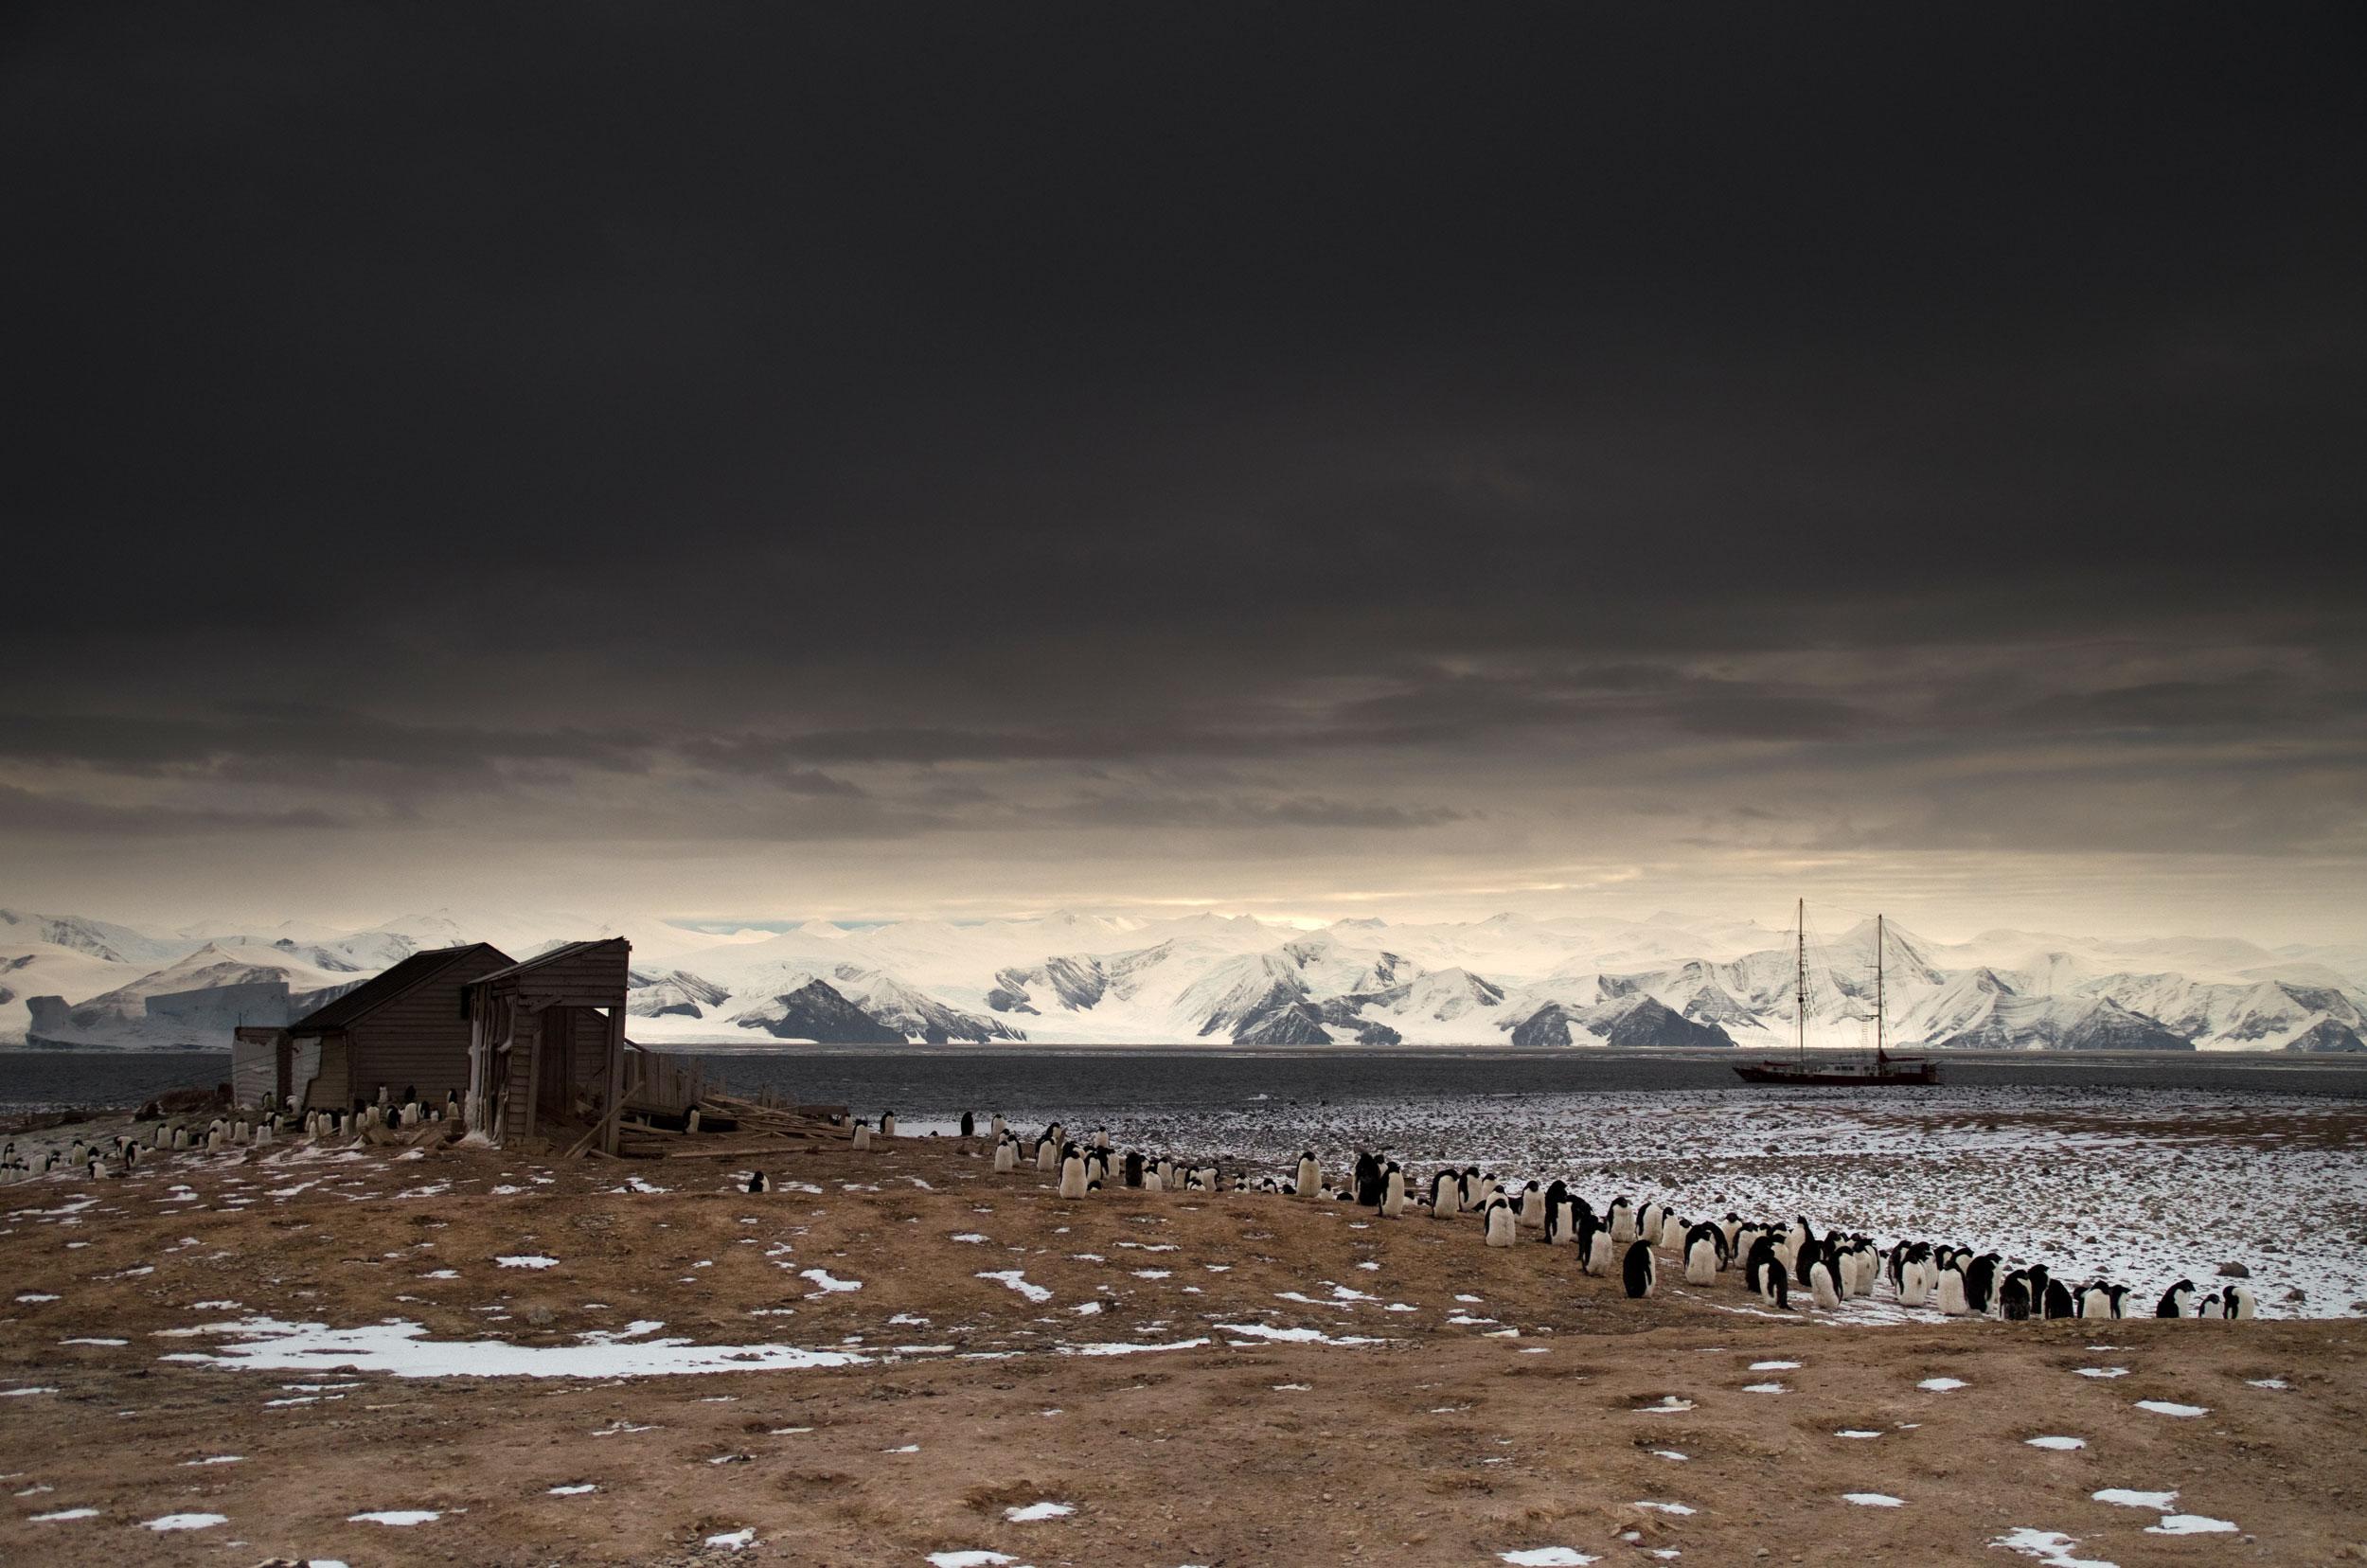 Dramatic beach. Photo: Nico Edwards